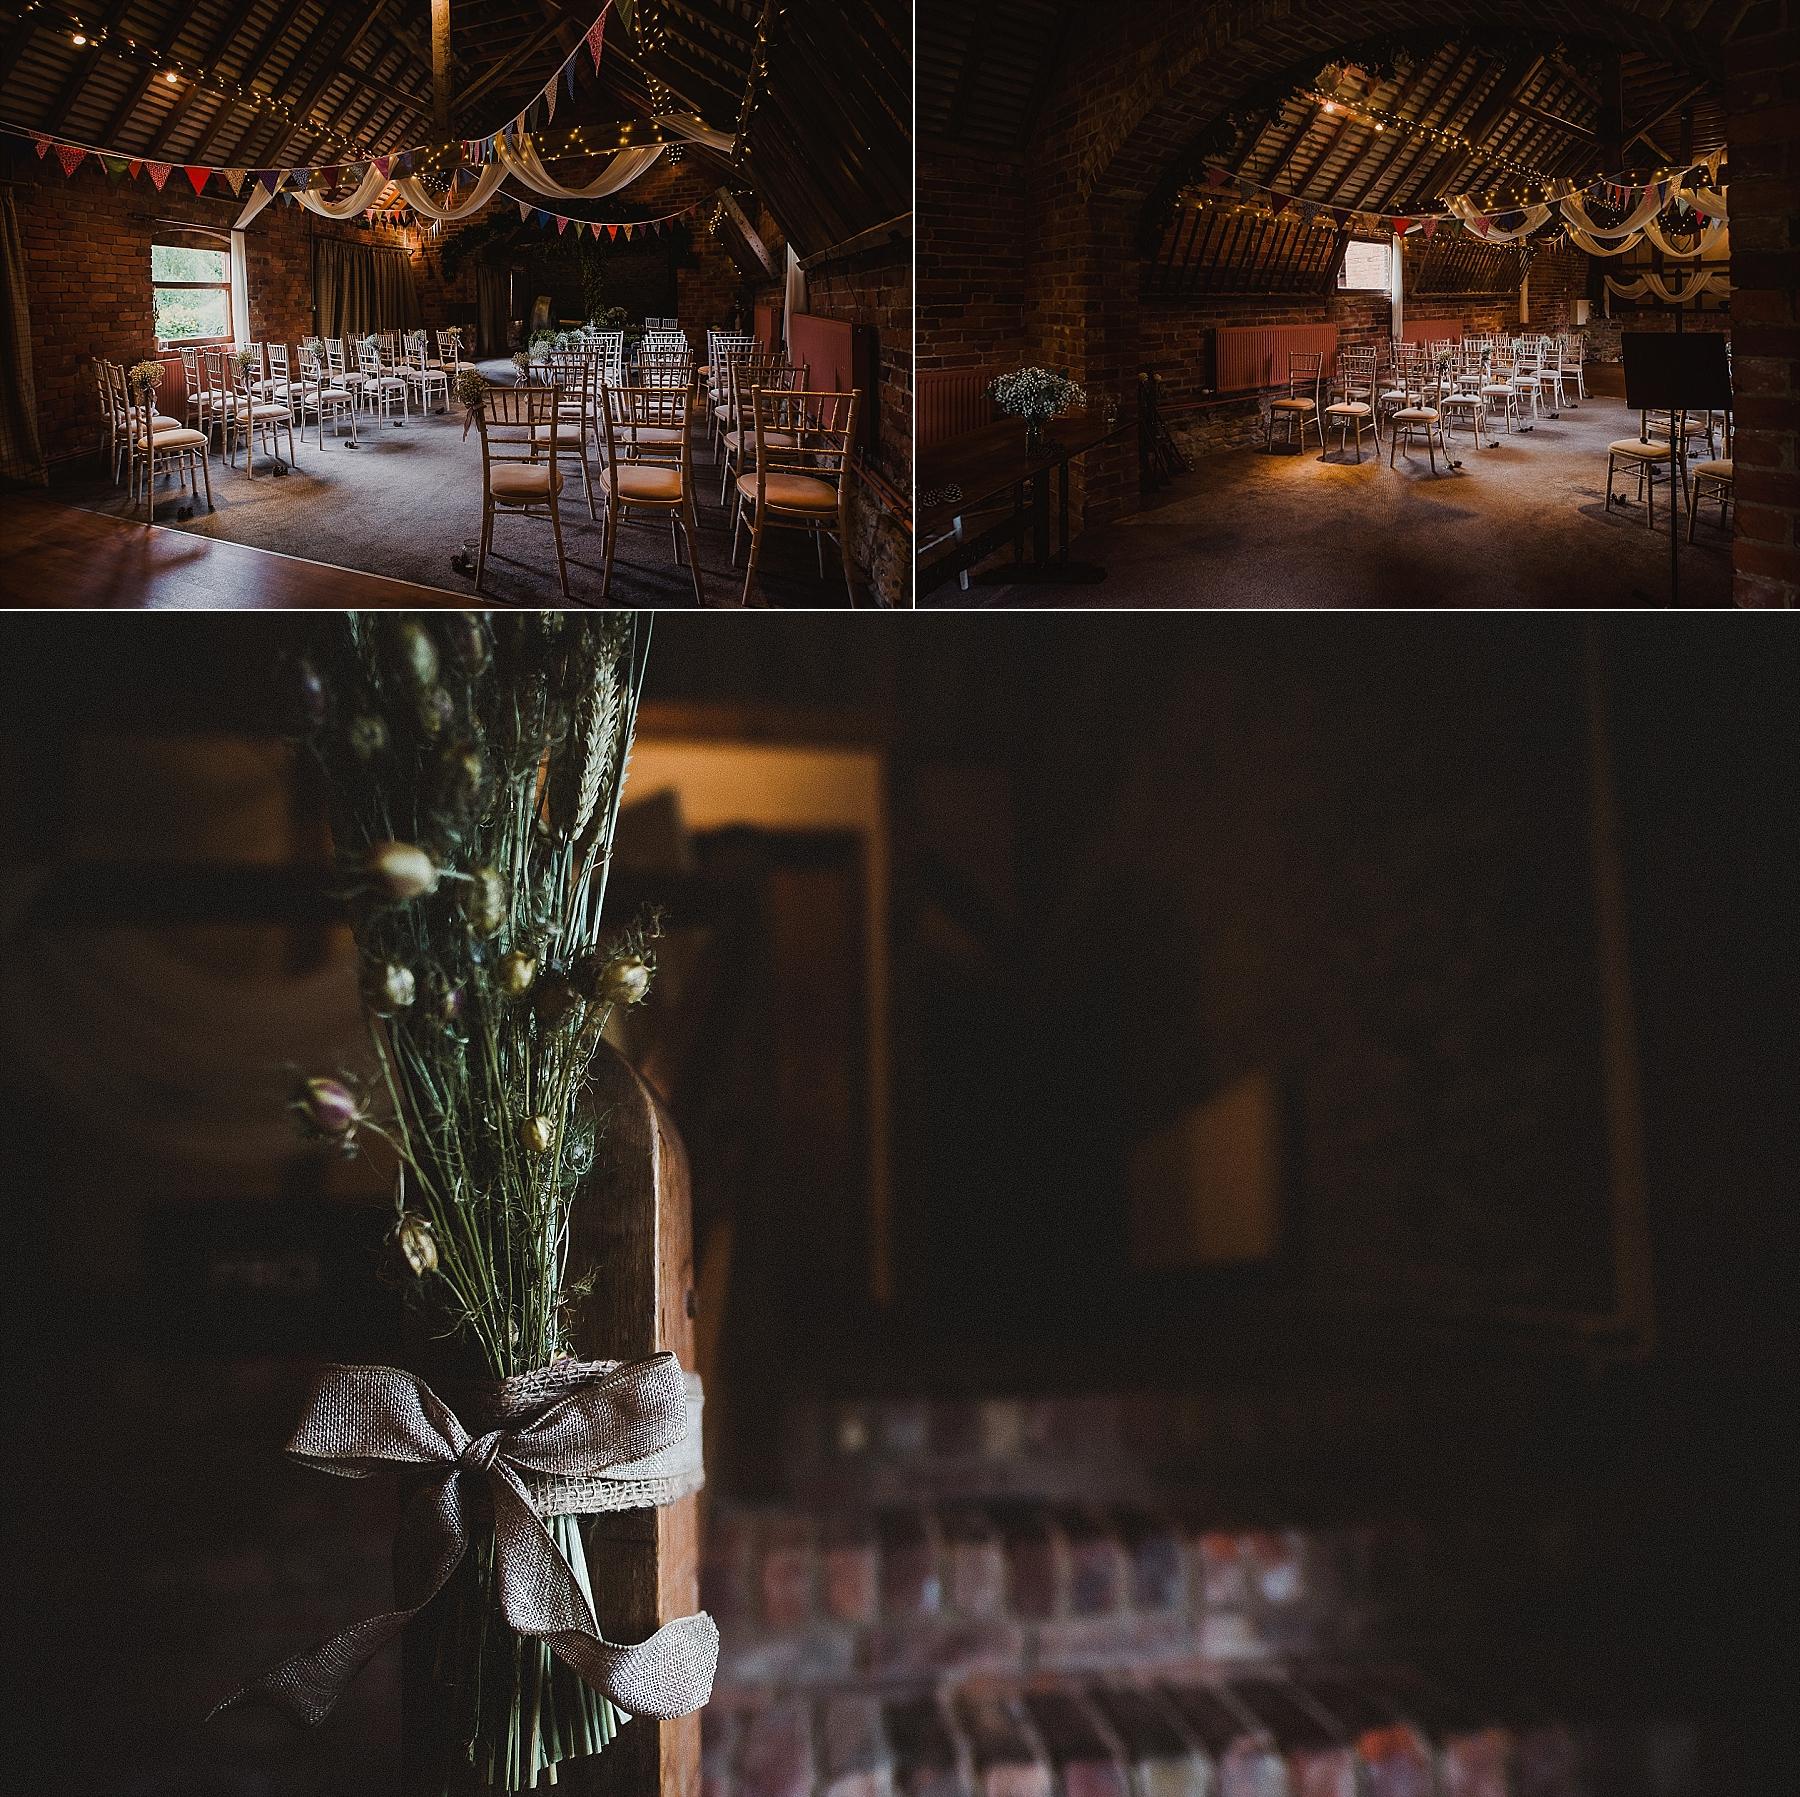 chris_keely_downton_lodge_wedding_0019.jpg